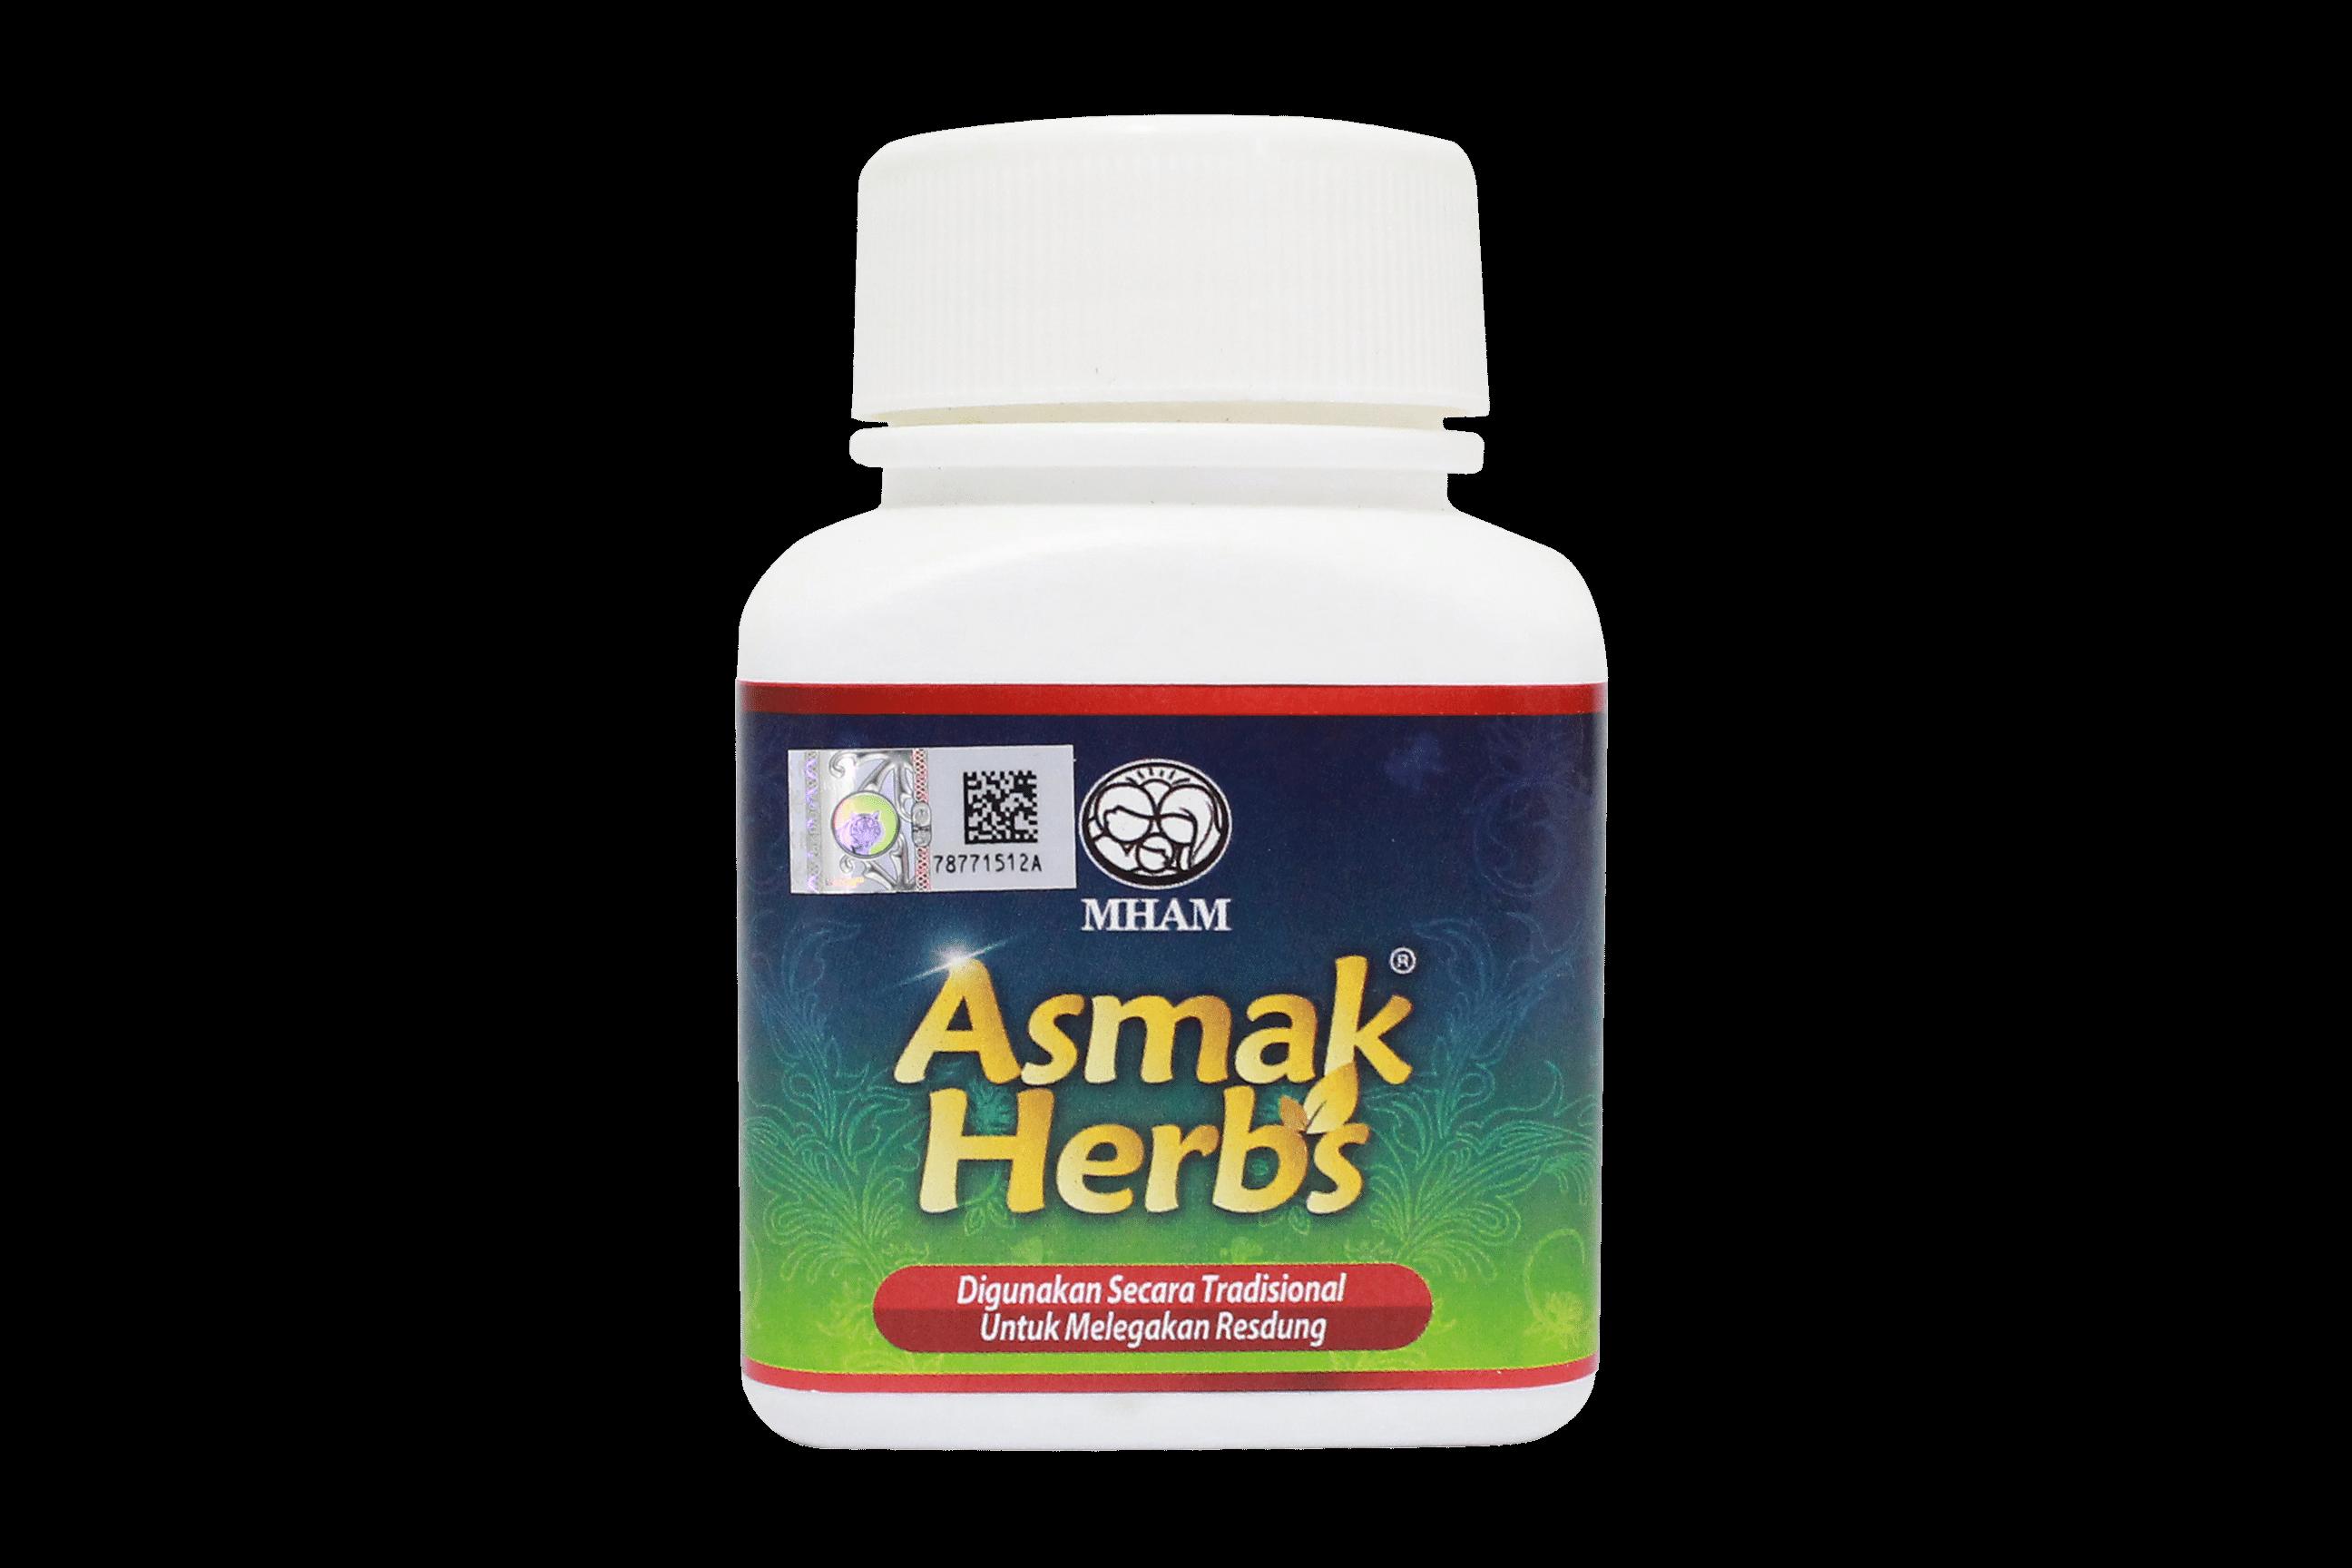 Ubat Resdung Asmak Herbs Mujarab Original | Asmak